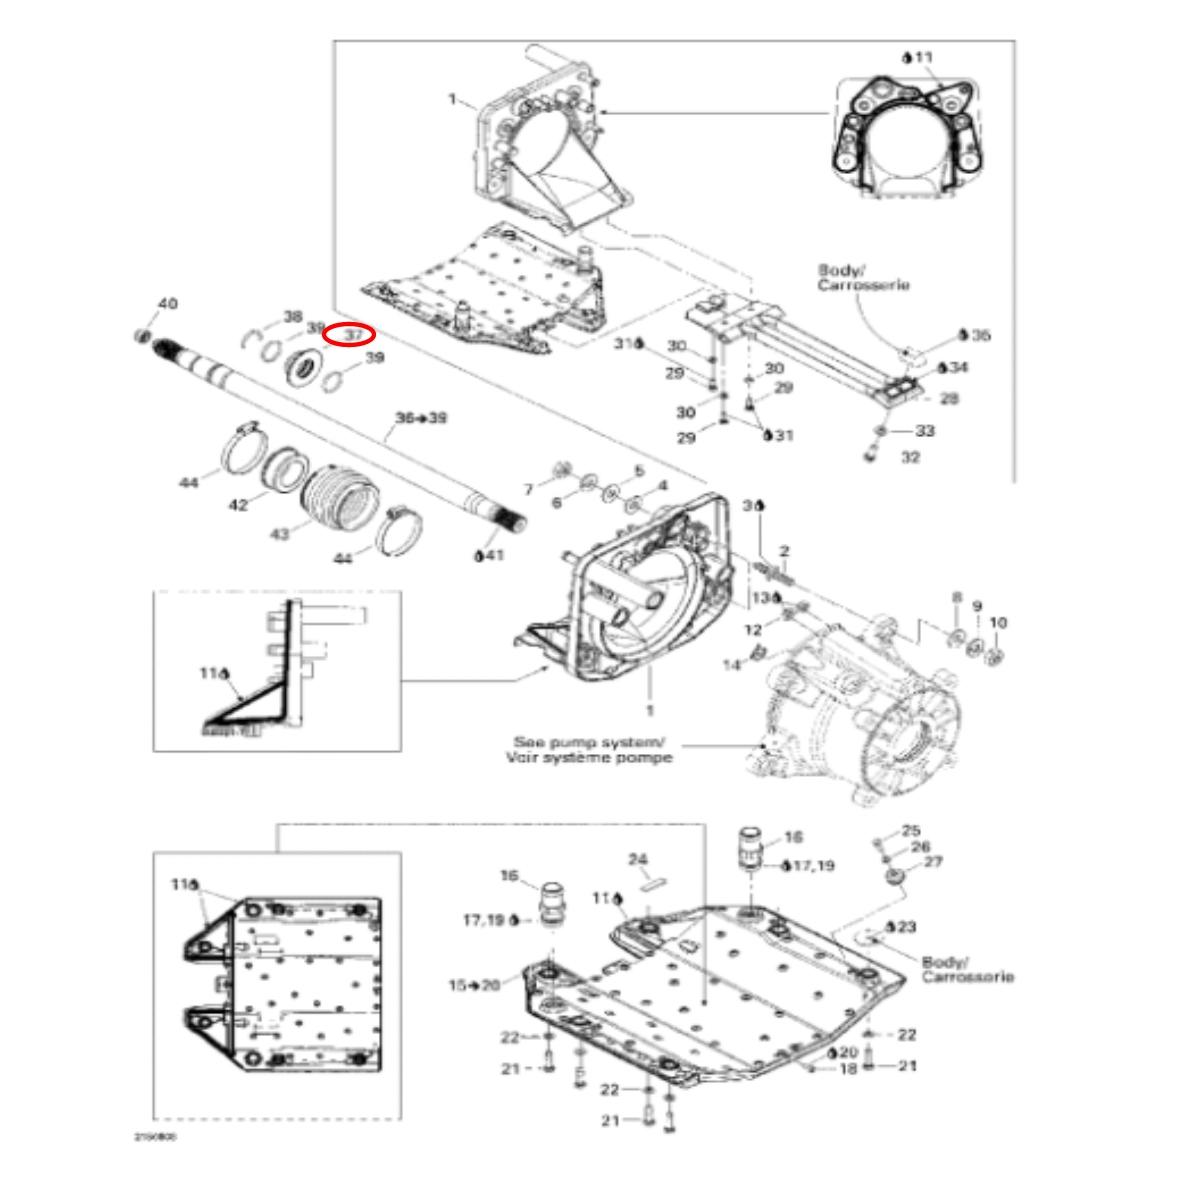 Bucha de Inox Anel de Carbono para Jet Ski Sea Doo 4 tec gti/gtx  - Radical Peças - Peças para Jet Ski